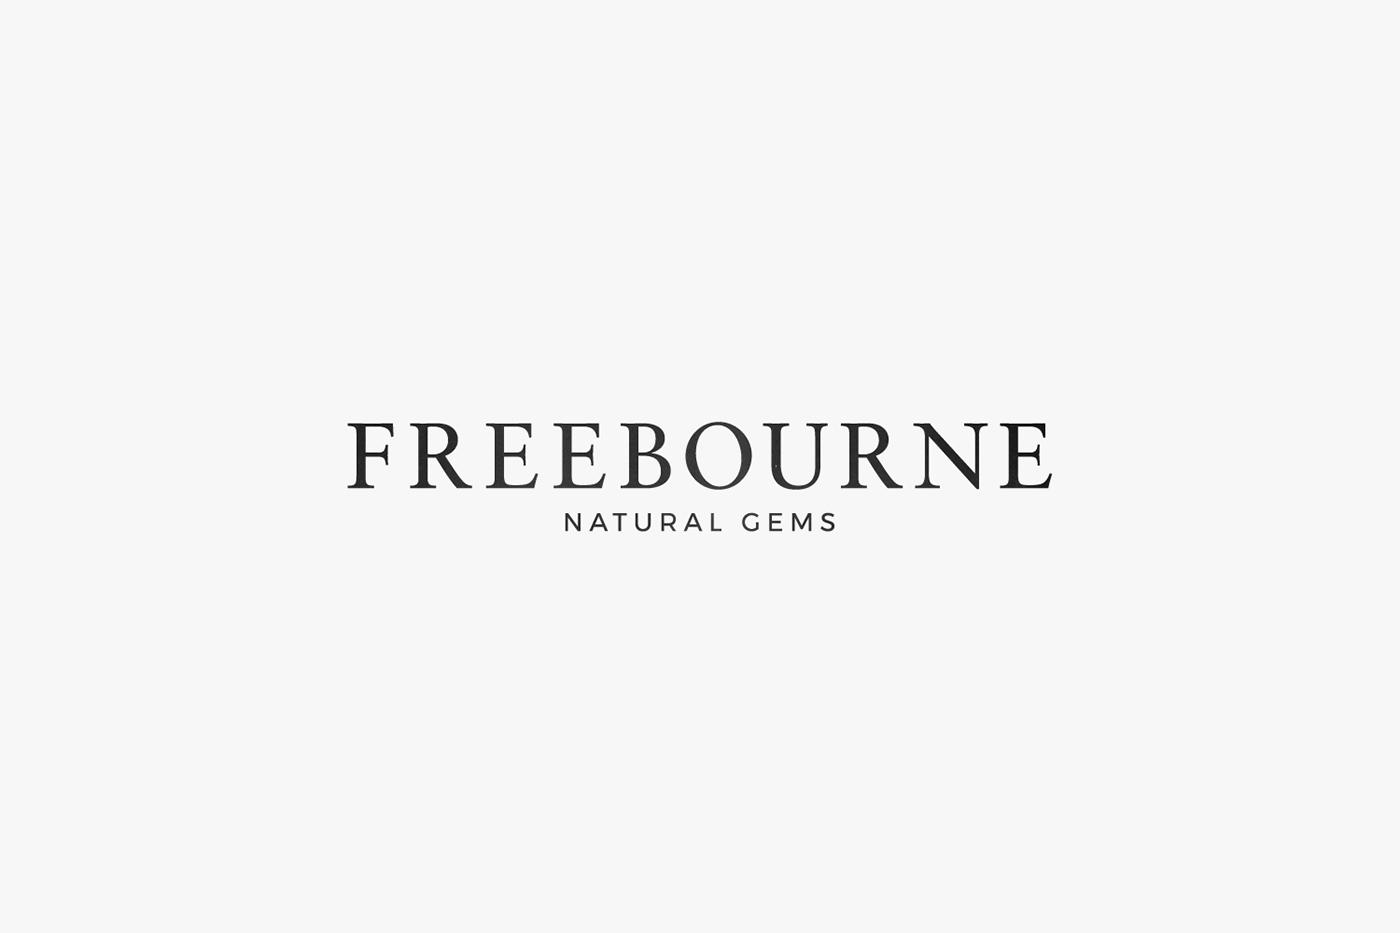 Paul Stancel Logo Design branding  brand identity monogram simple minimalist minimal bold Freebourne